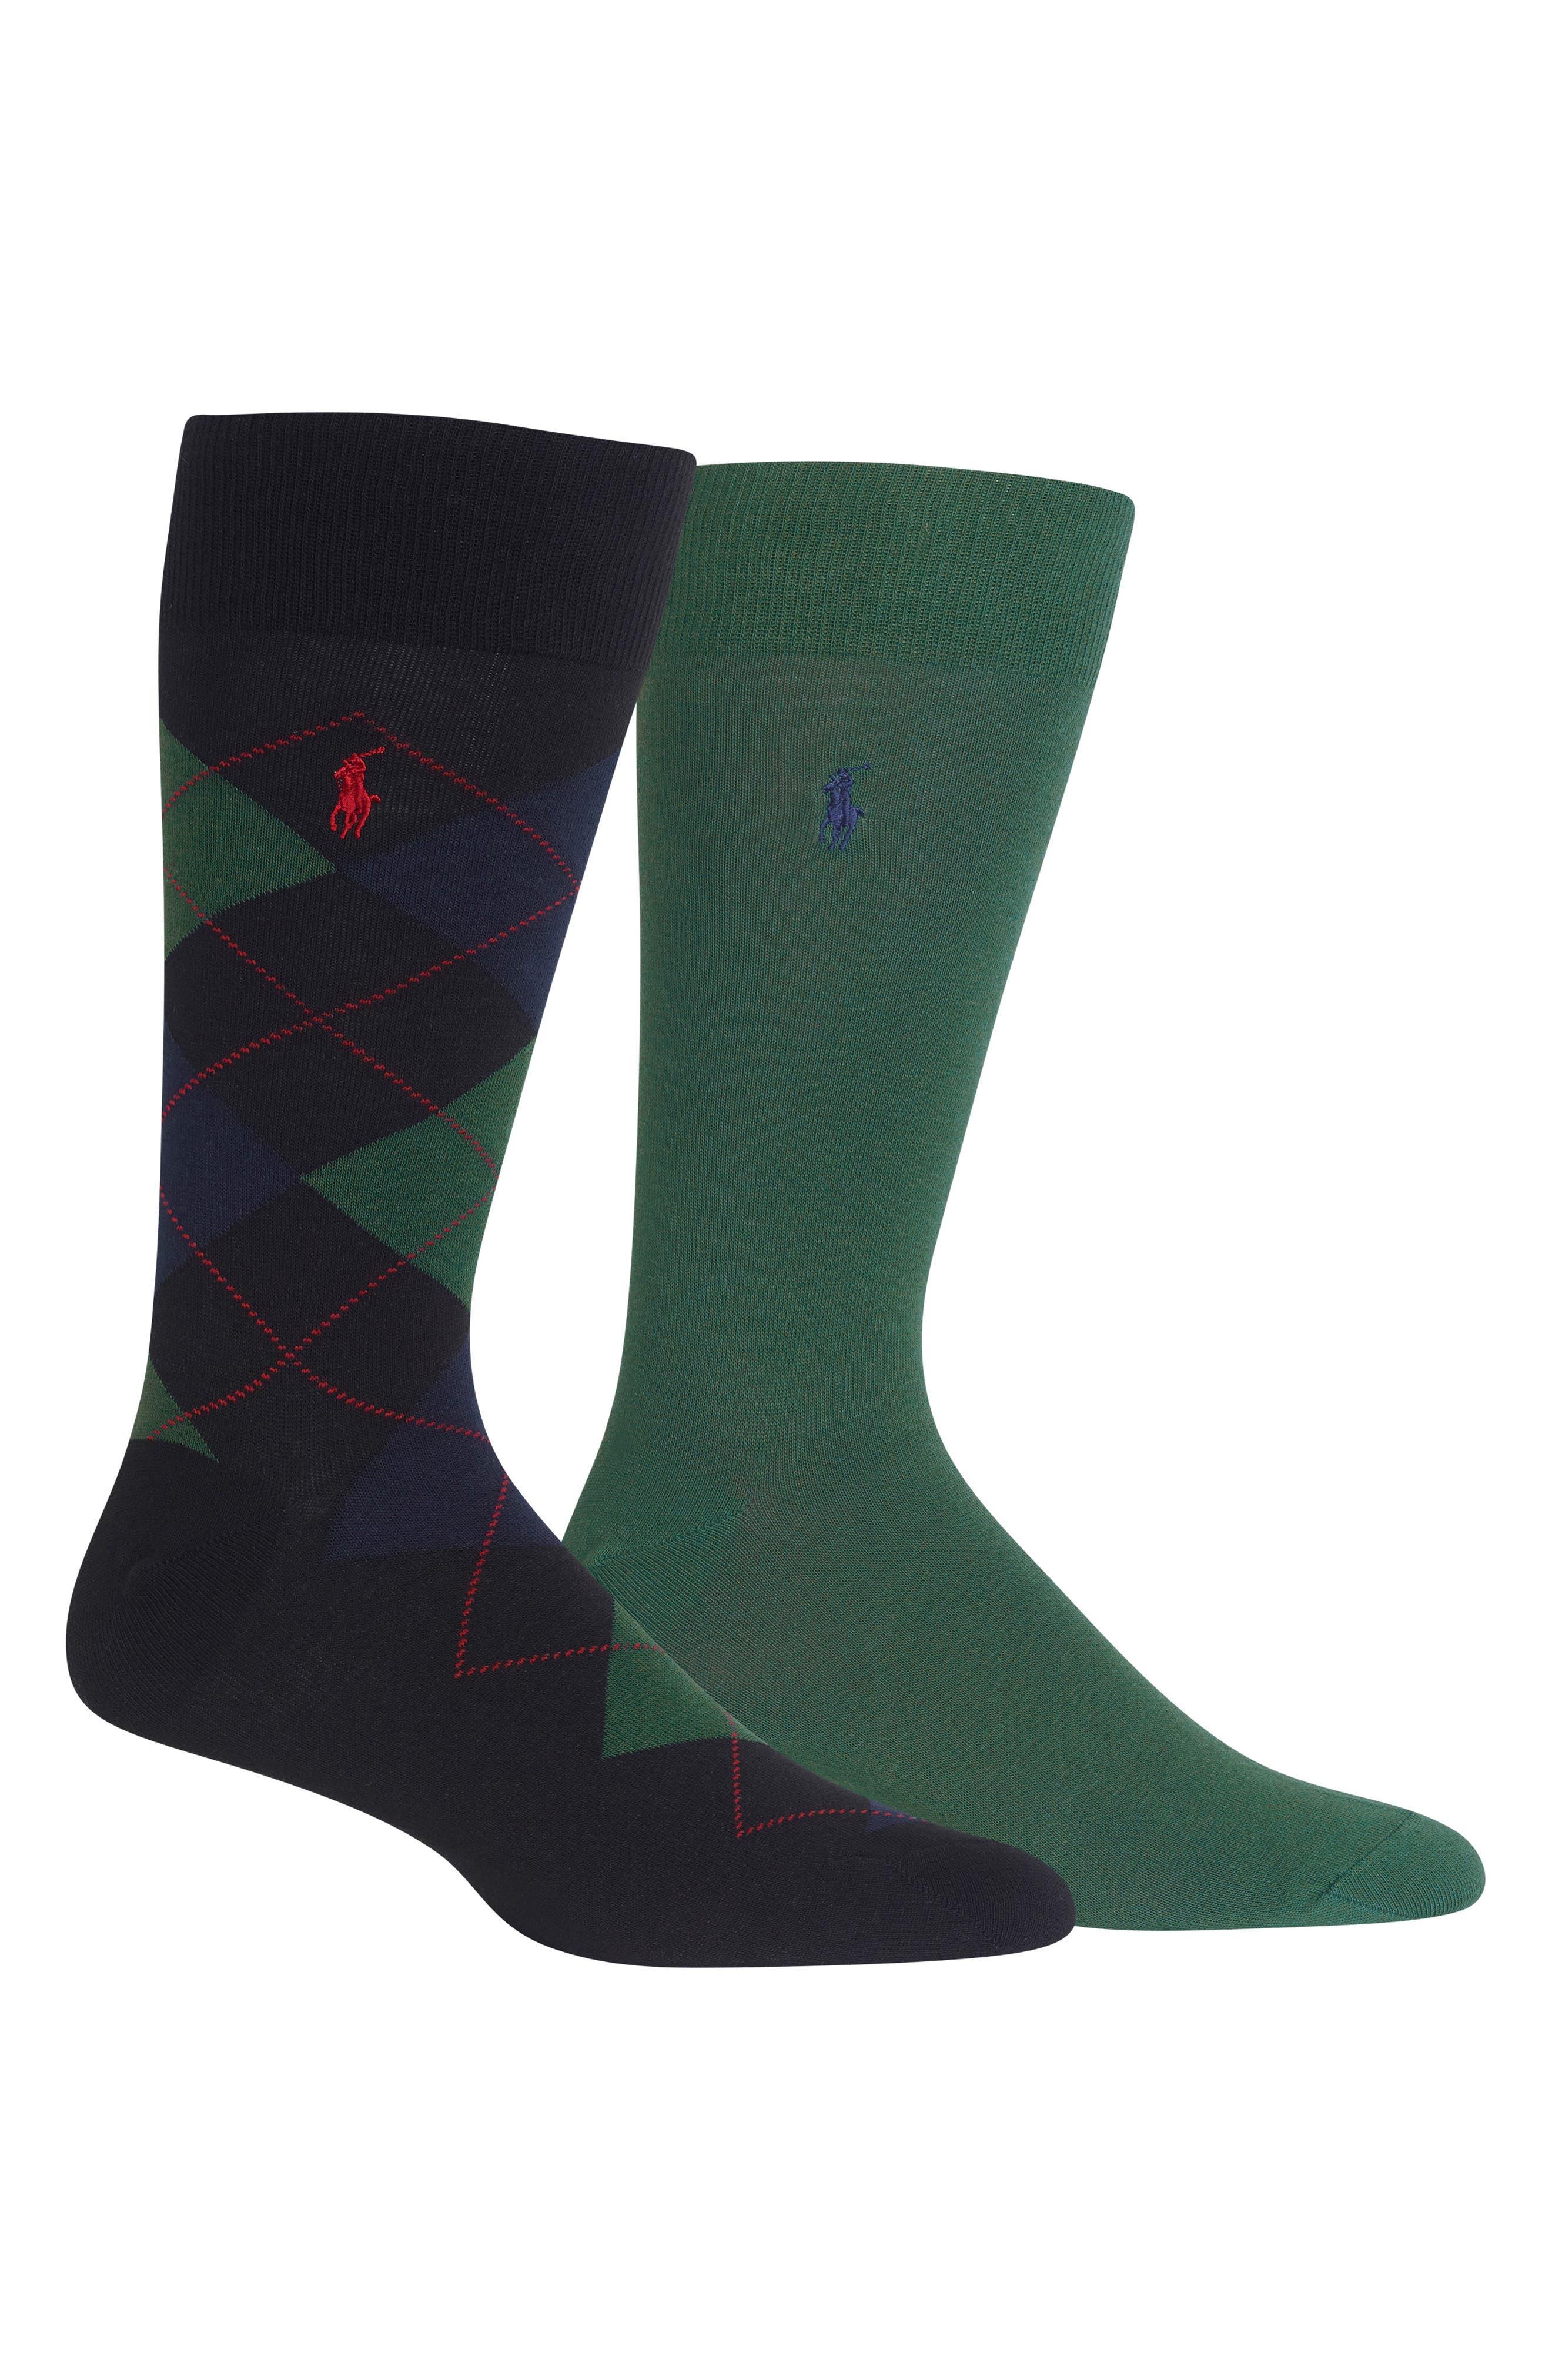 Cotton Blend Socks,                             Main thumbnail 1, color,                             005